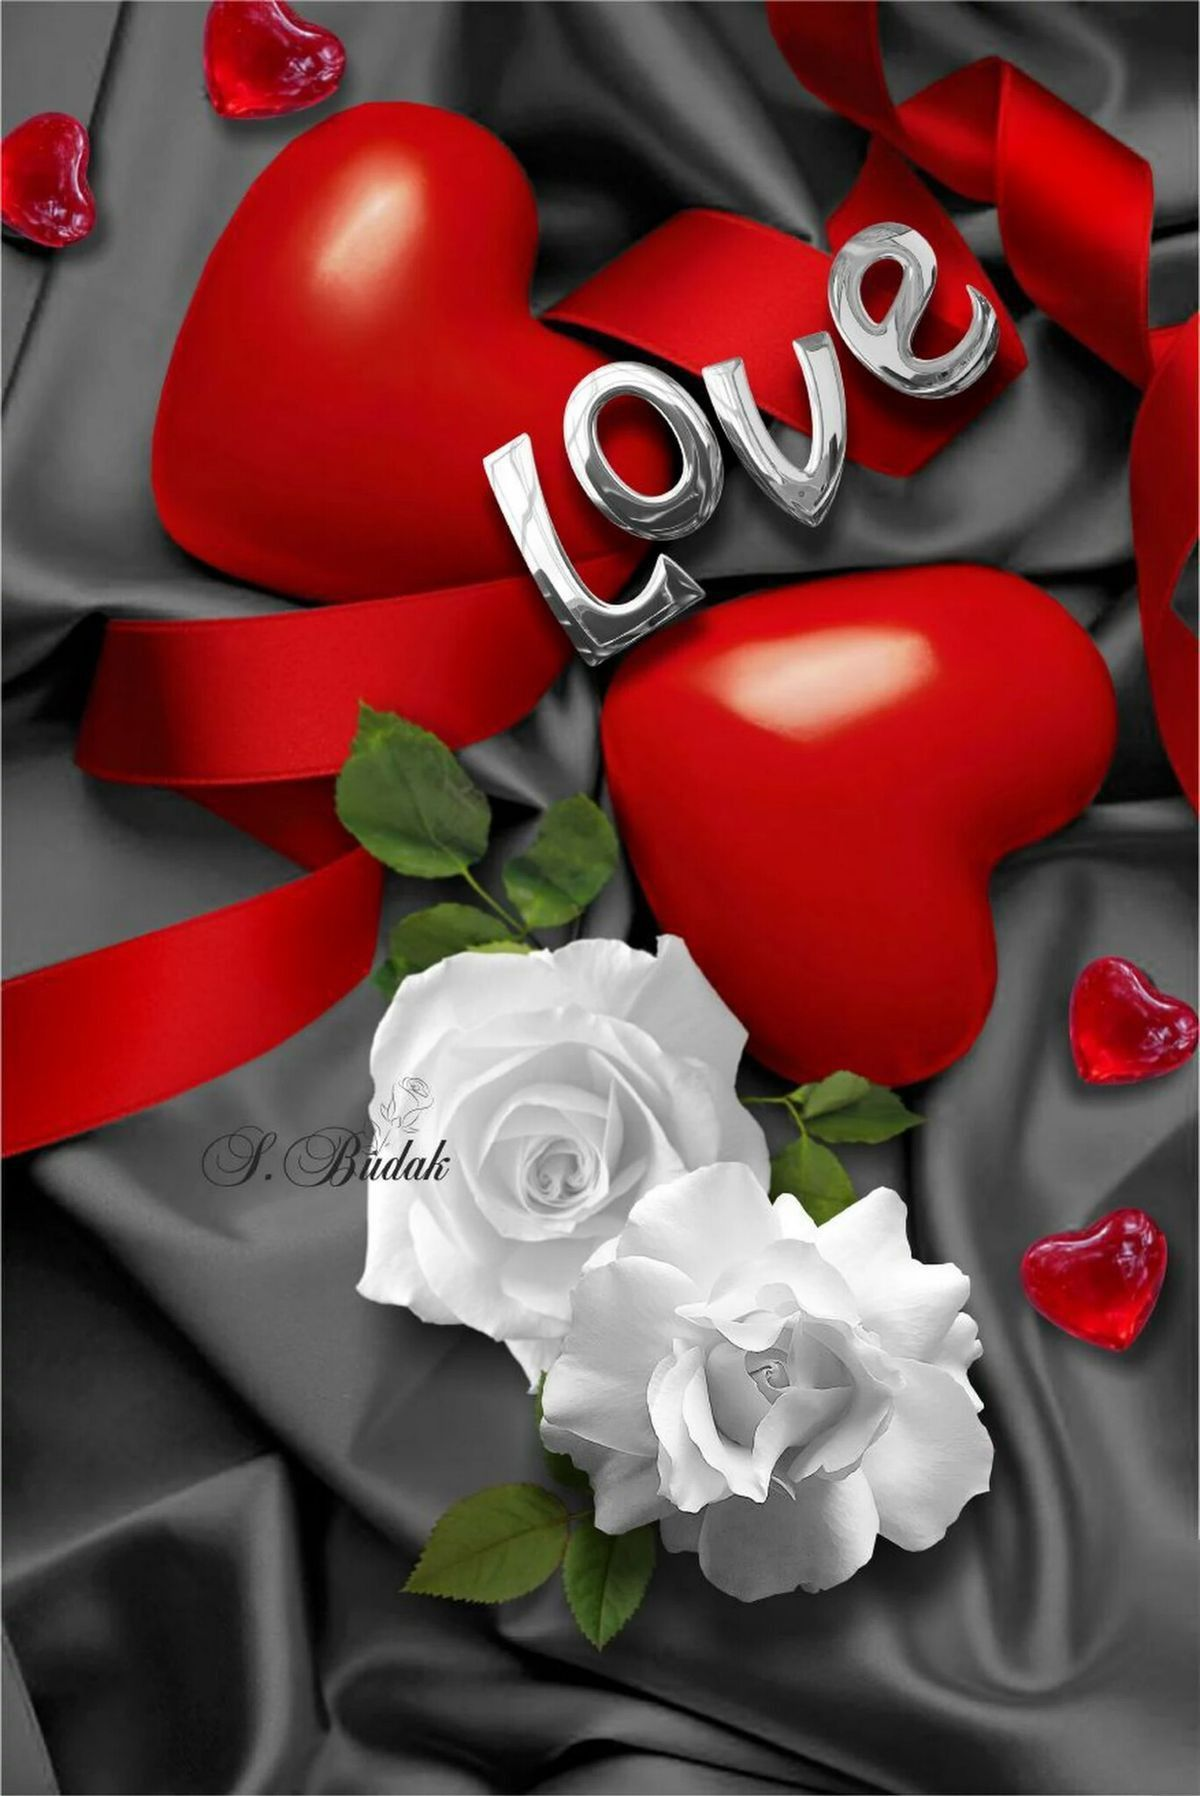 Pin By Yvonne Vermeulen On Liefde Wallpaper Iphone Love Love Heart Gif Love Heart Images